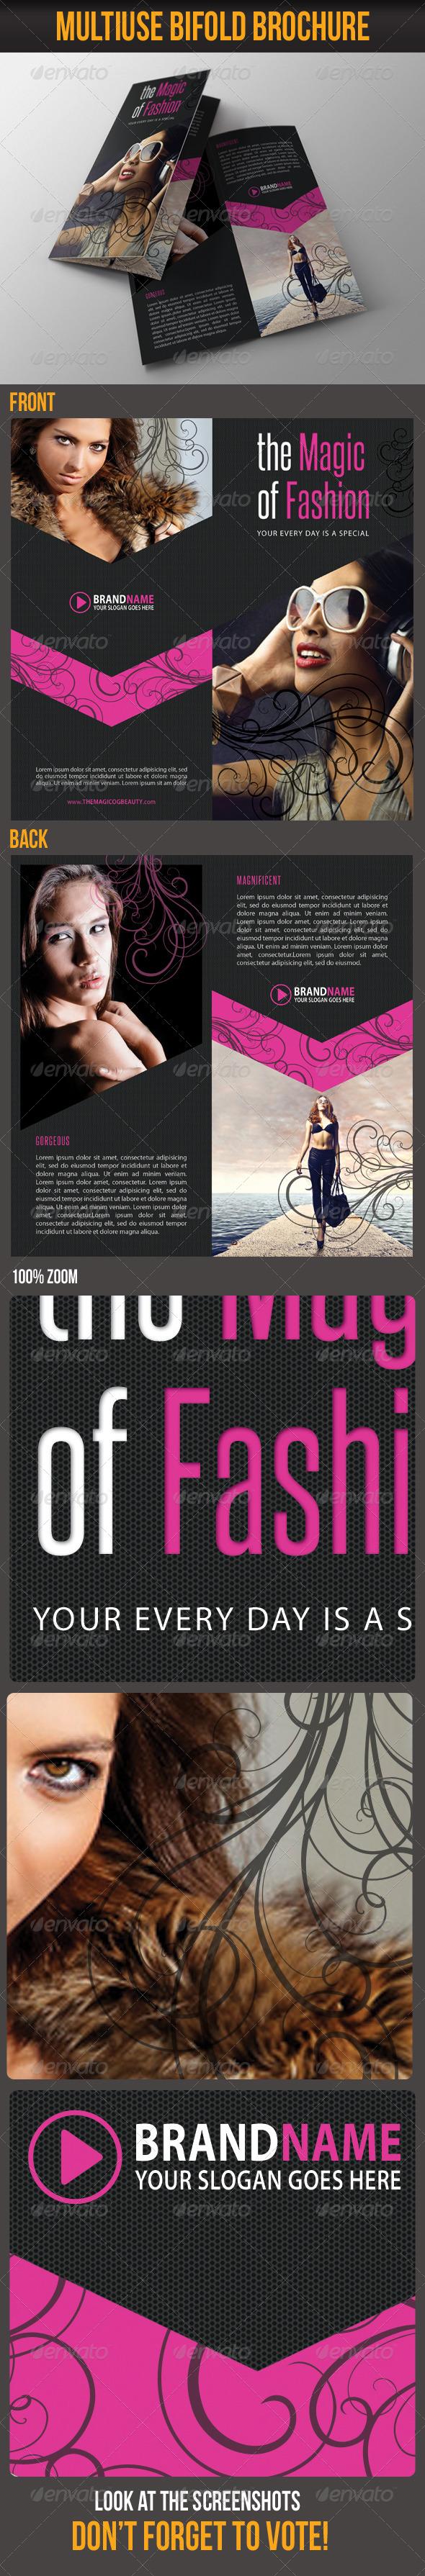 Multiuse Bifold Brochure 27 - Catalogs Brochures